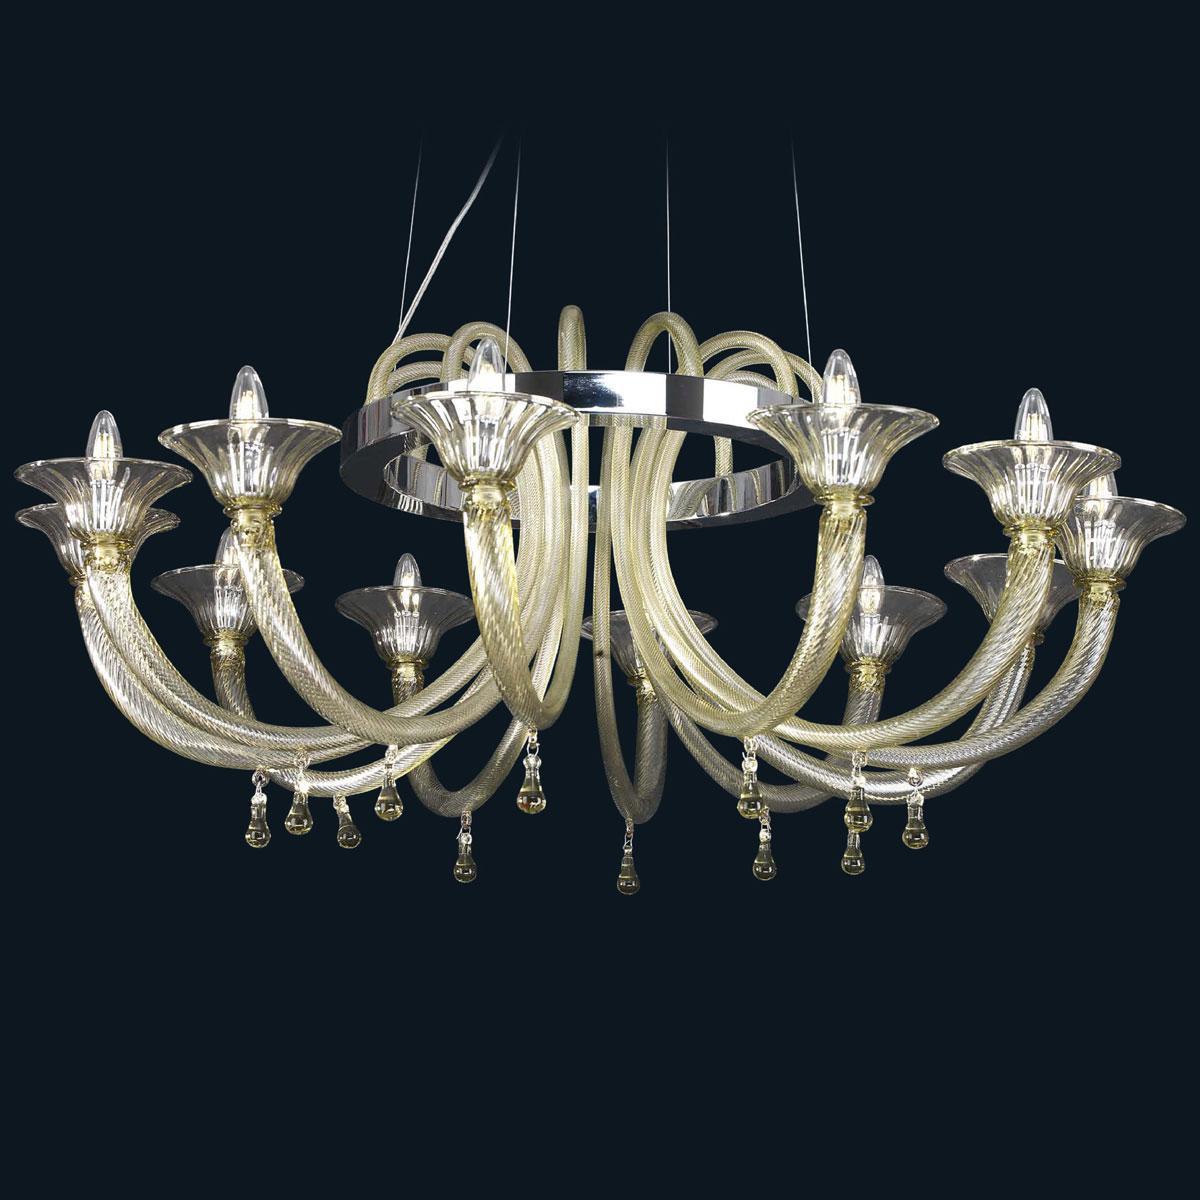 """Maggie"" Murano glass chandelier - 12 lights - smoke"